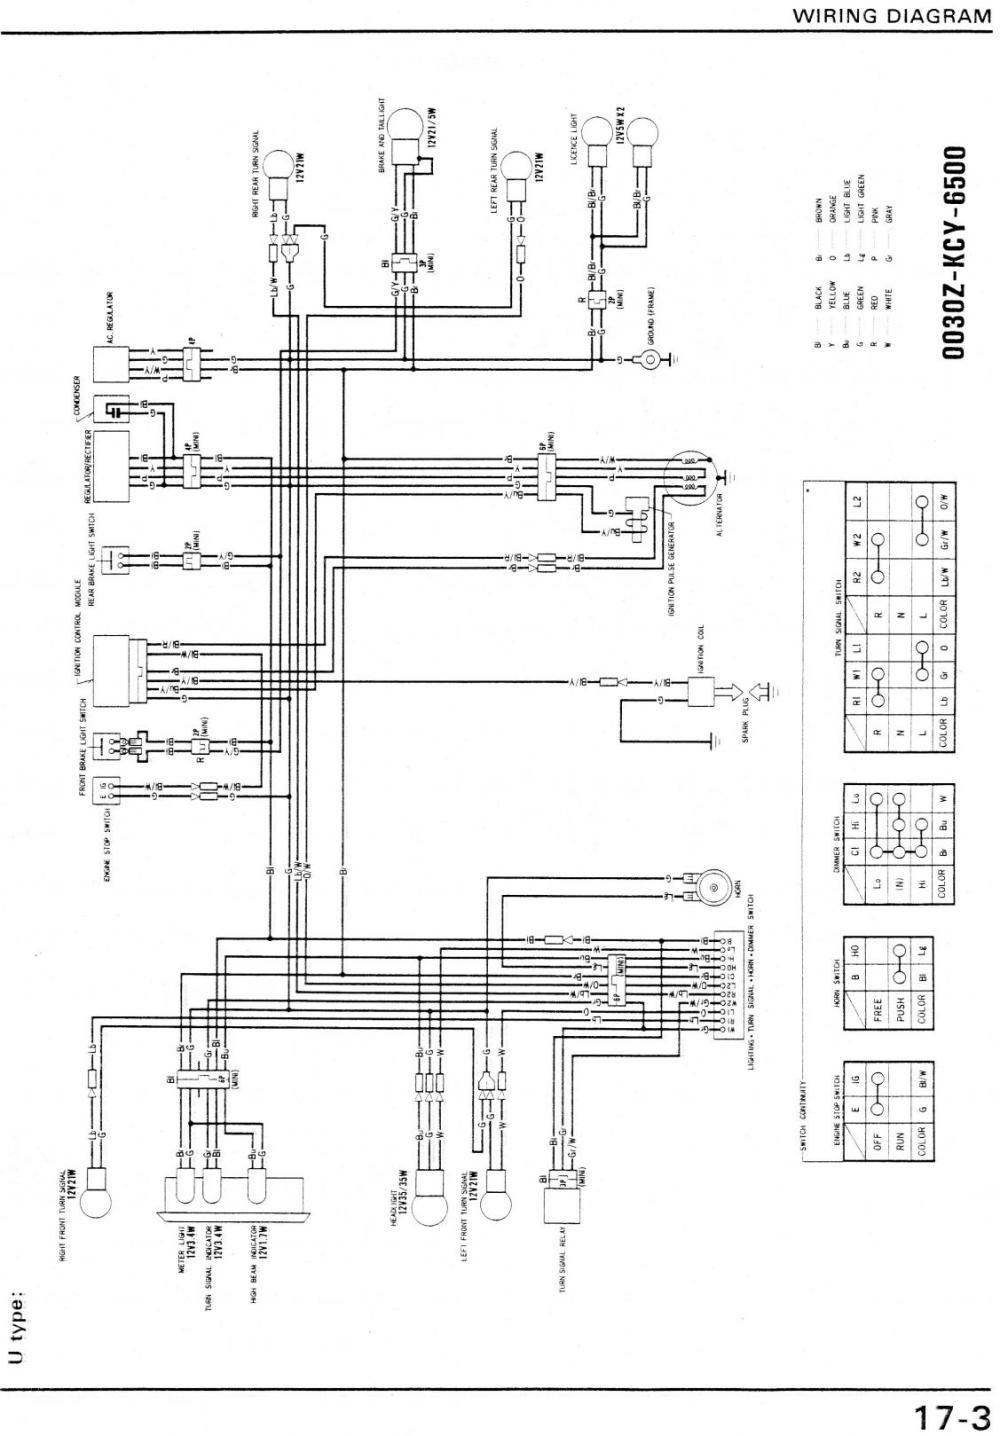 medium resolution of air handler wiring diagrams in addition heil air handler wiring